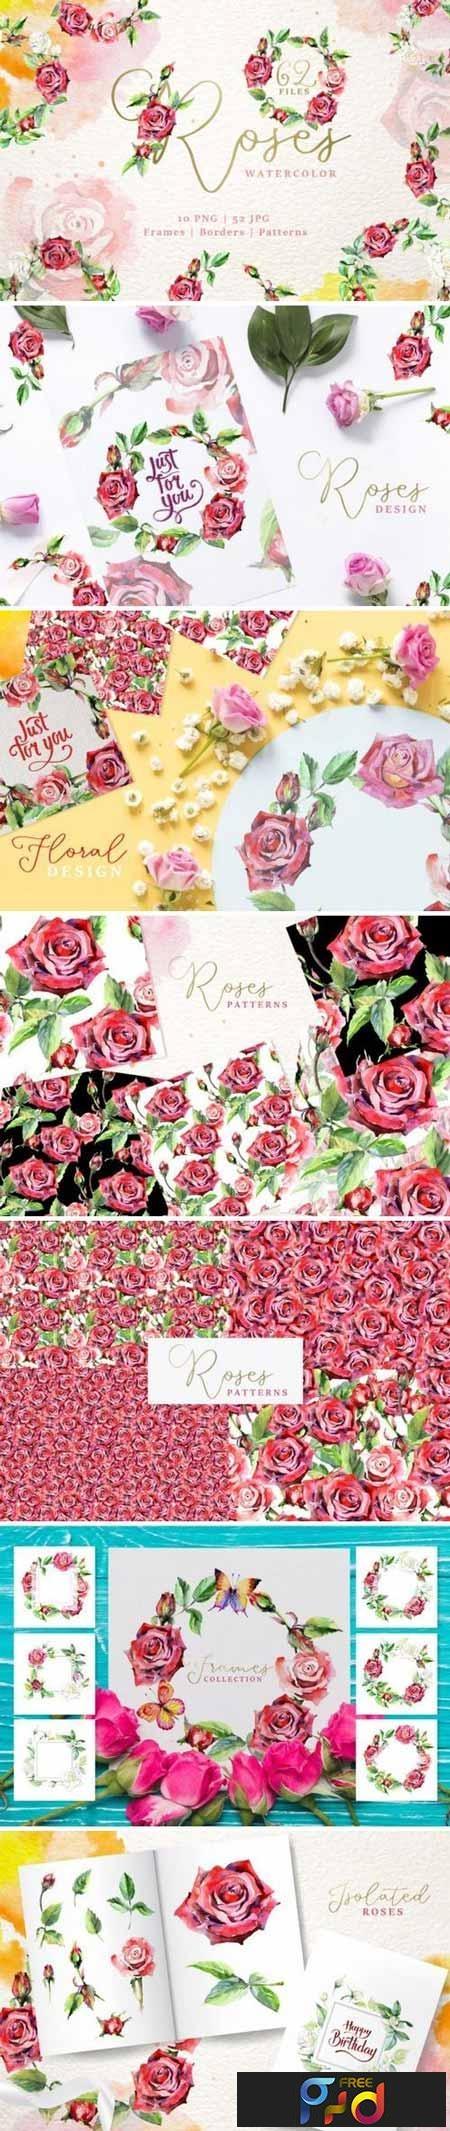 Wonderful watercolor red roses PNG 3437865 1